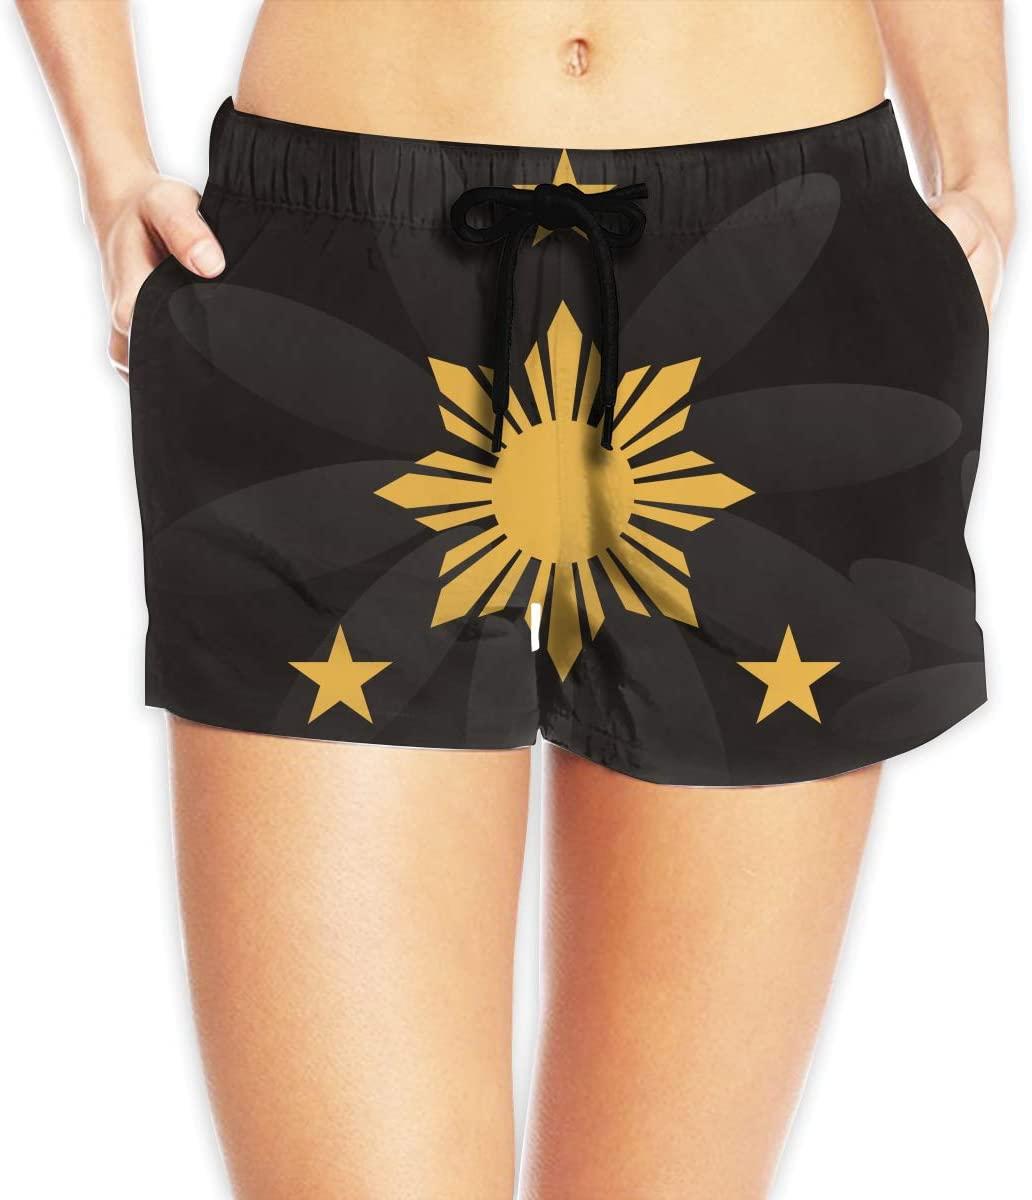 Hdecrr FFRE W Filipino Stars and Sun Women's Shorts Summer Quick Dry Drawstring Elastic Waist Casual Pants